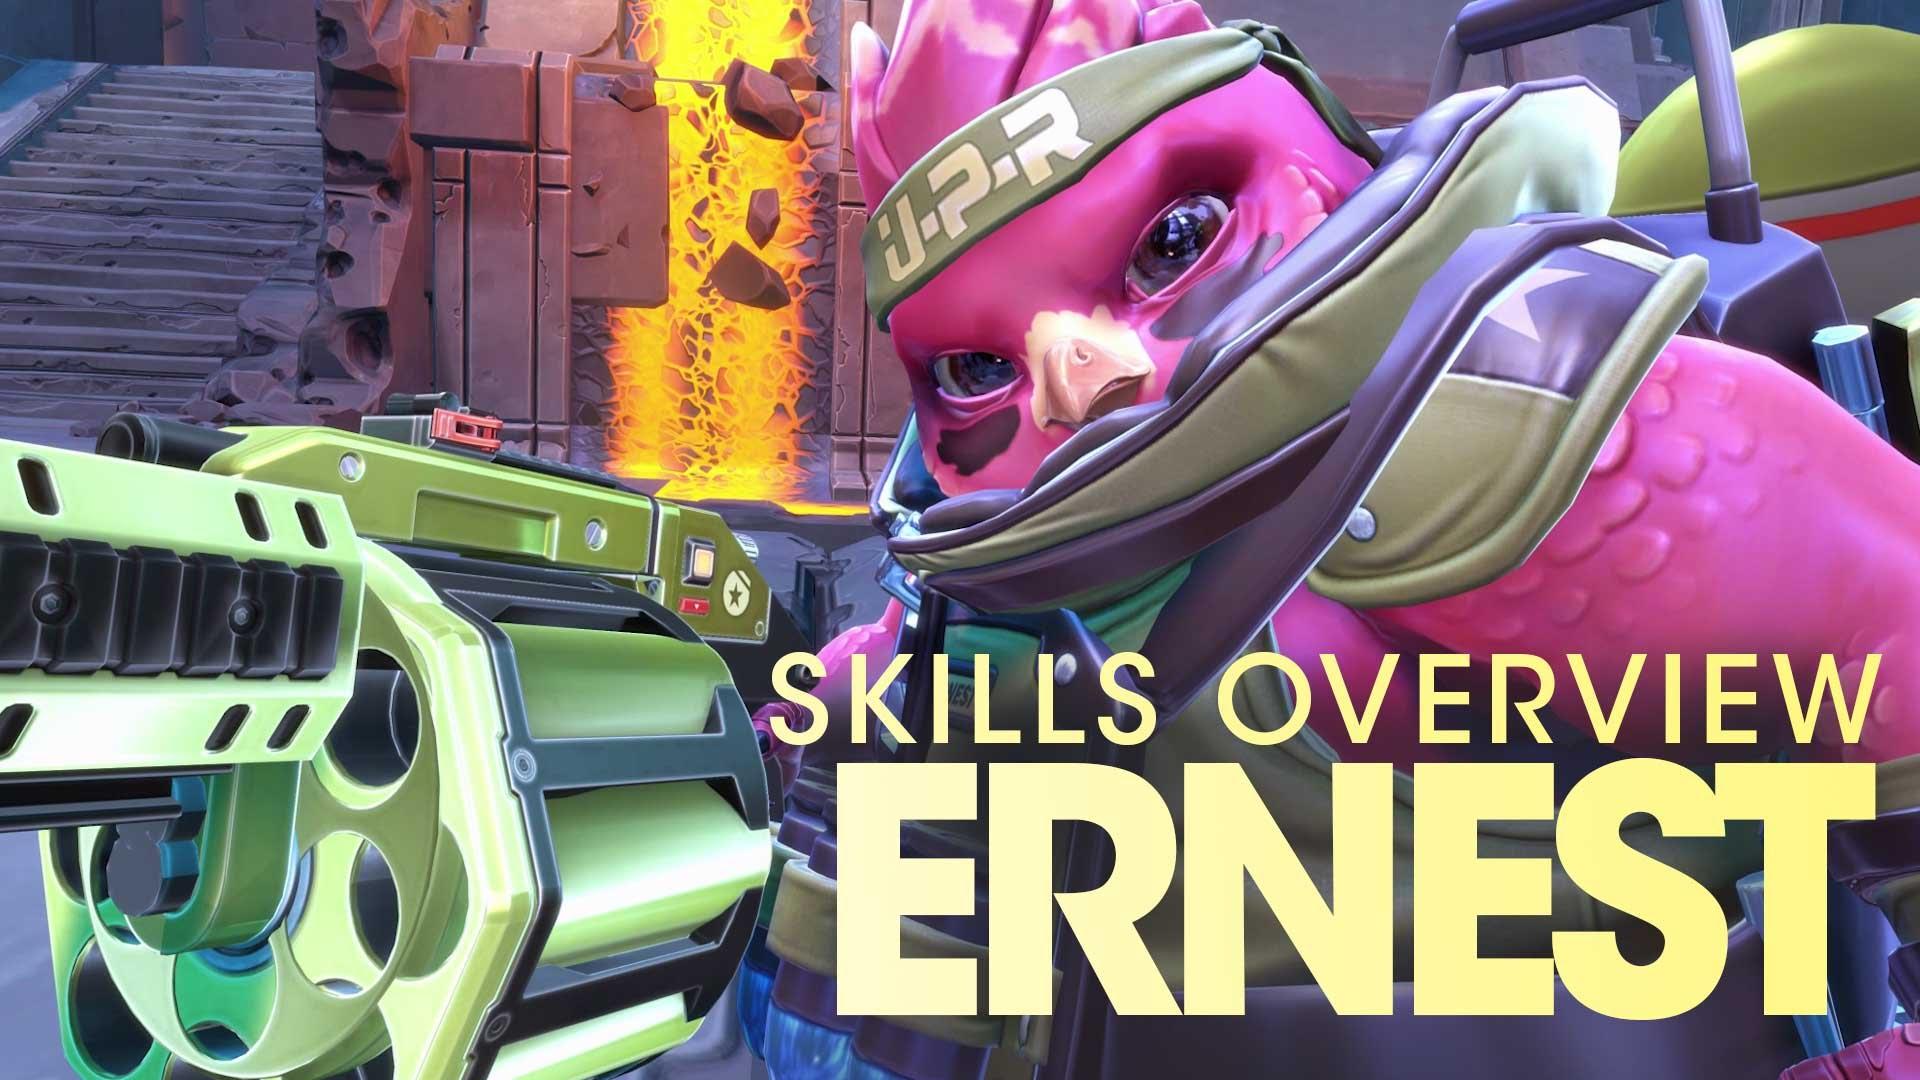 Battleborn - Ernest Skills Overview